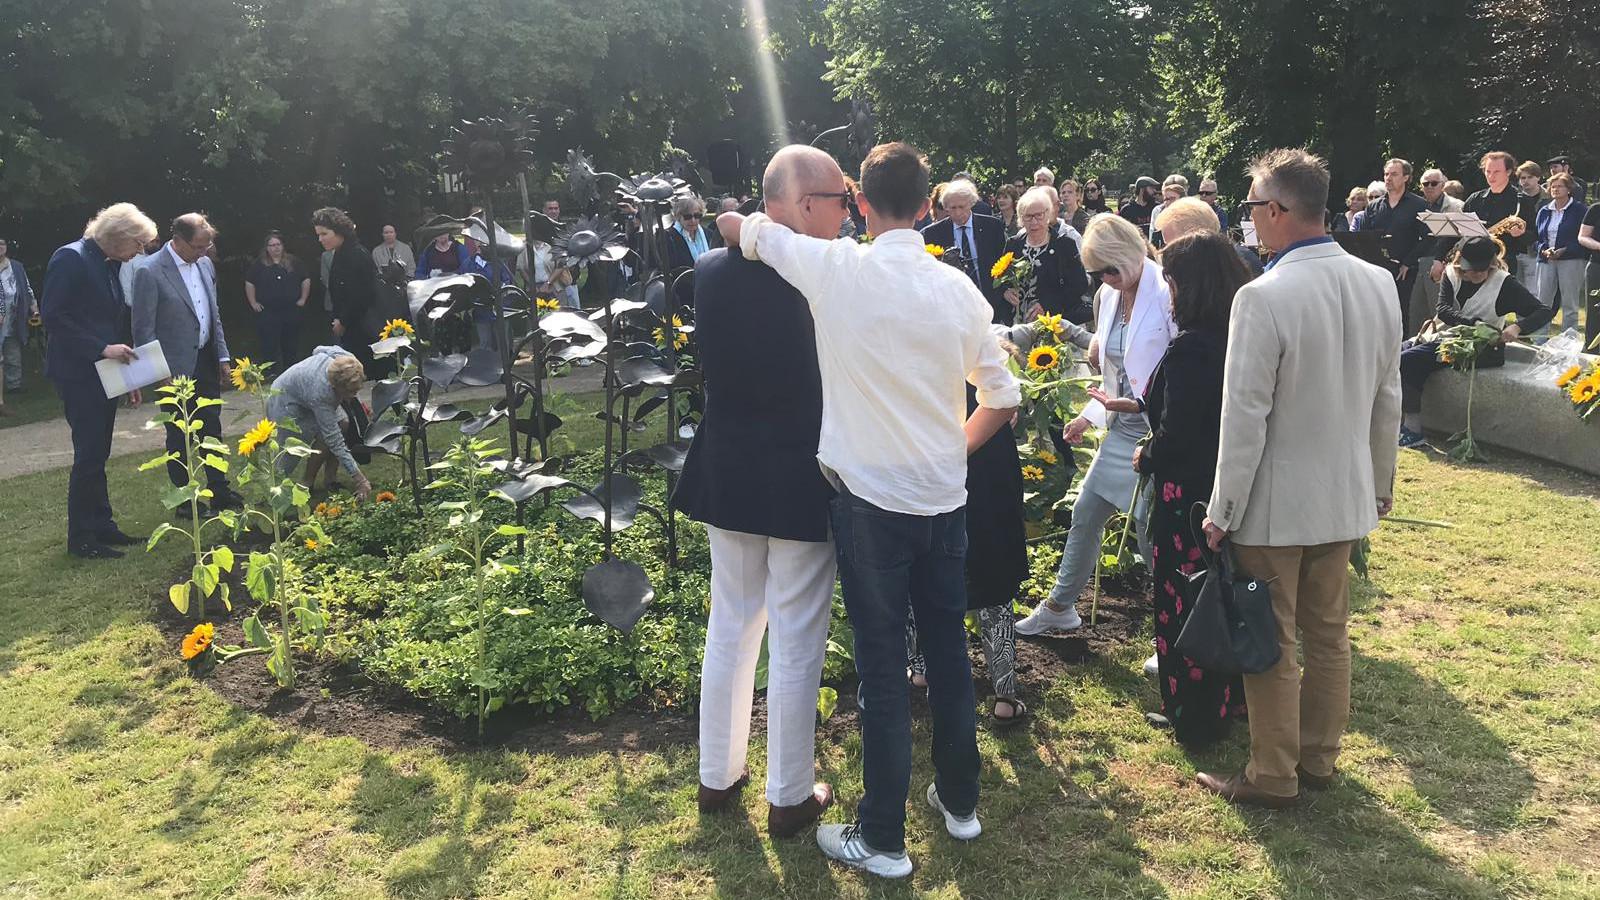 NH Nieuws/Carlijn Kolk